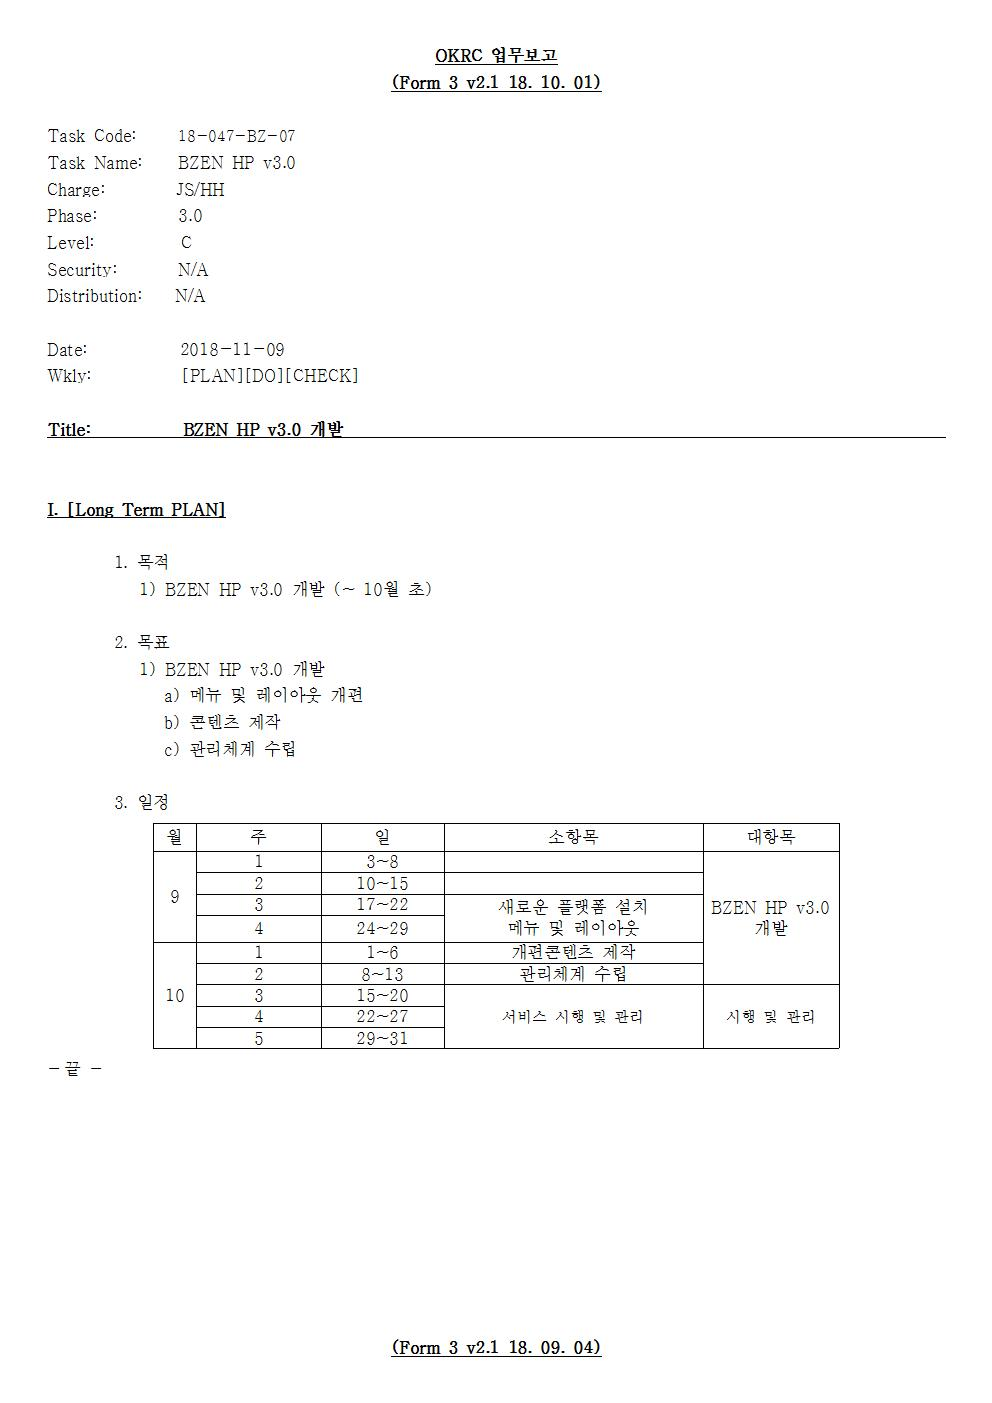 D-[18-047-BZ-07]-[BZEN HP v3.0]-[2018-11-09][HH]001.jpg